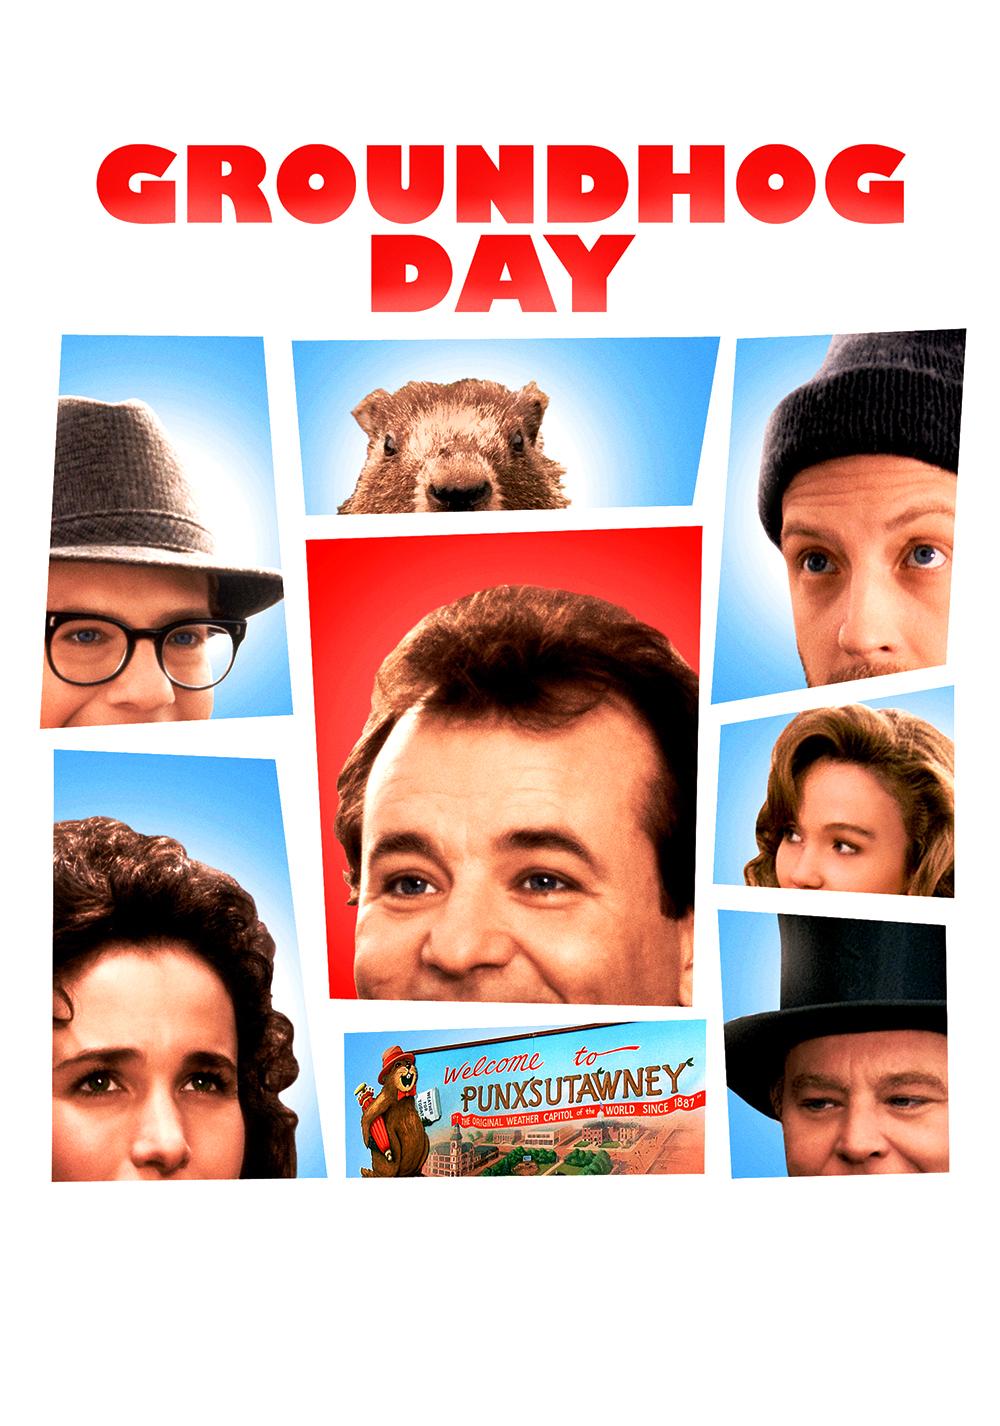 Grounhog day the movie